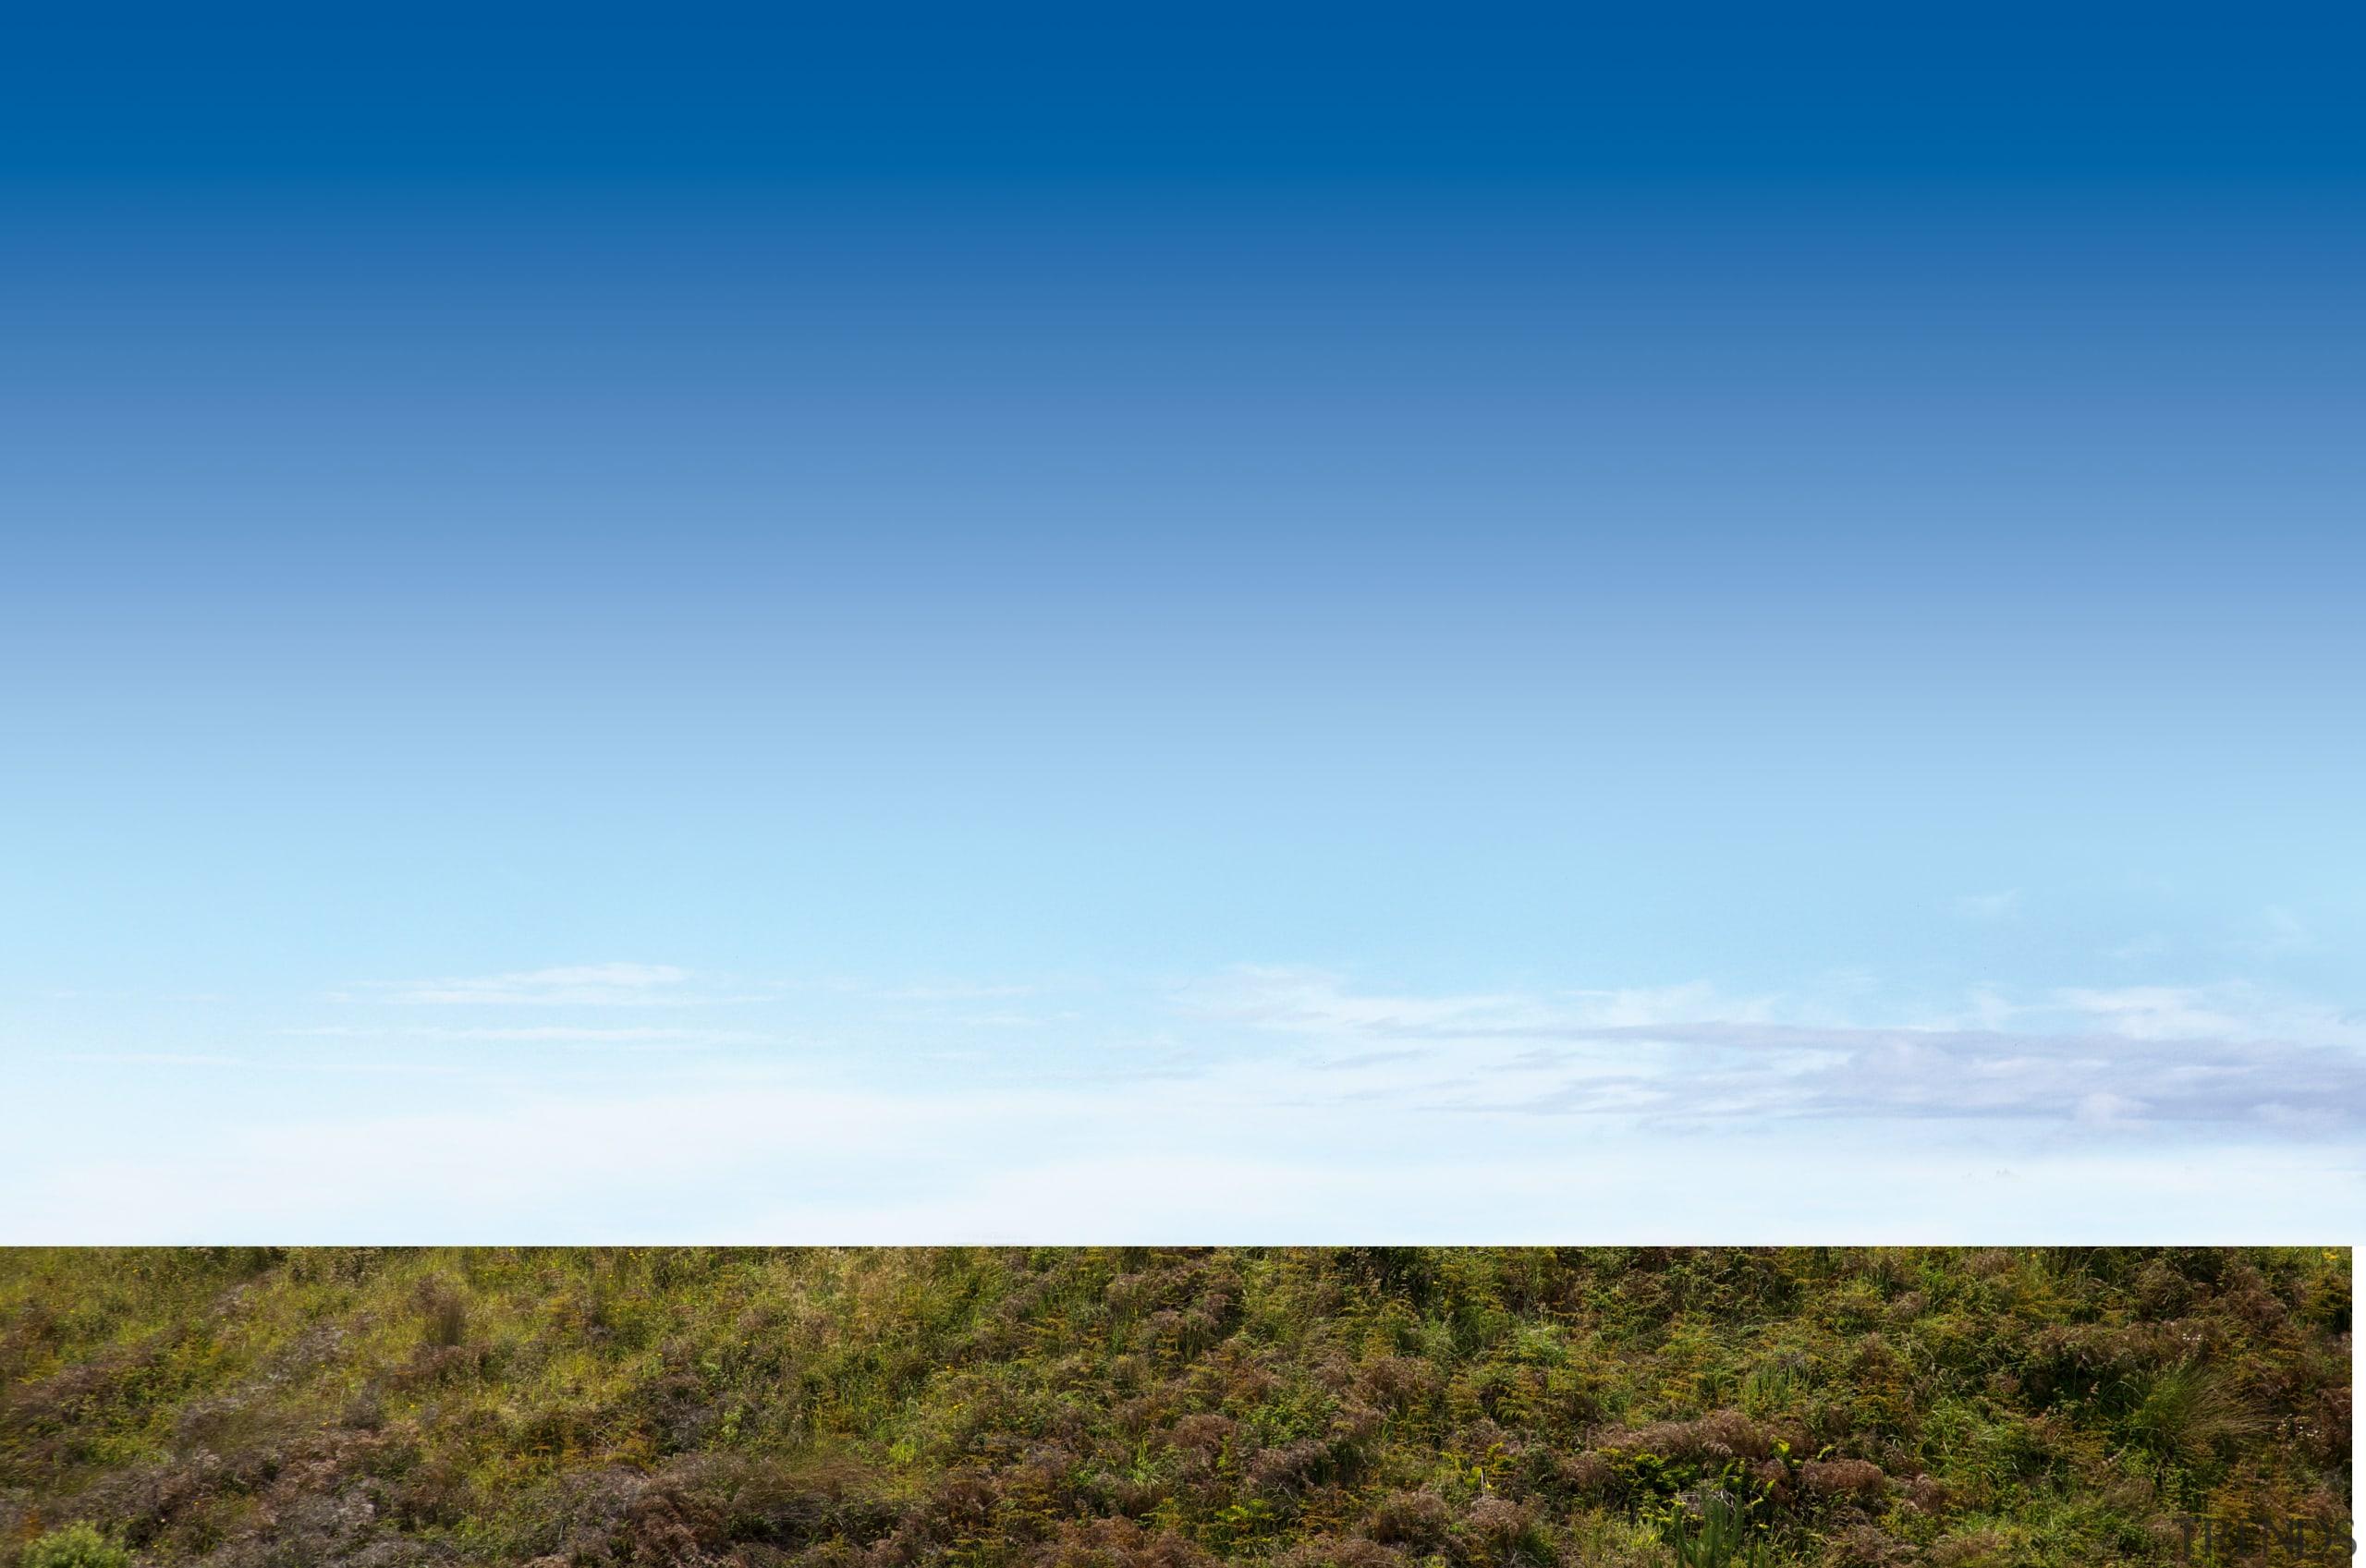 This new Lockwood beach house was custom designed atmosphere, cloud, daytime, ecoregion, ecosystem, field, grass, grassland, highland, hill, horizon, meadow, plain, prairie, sky, steppe, tree, teal